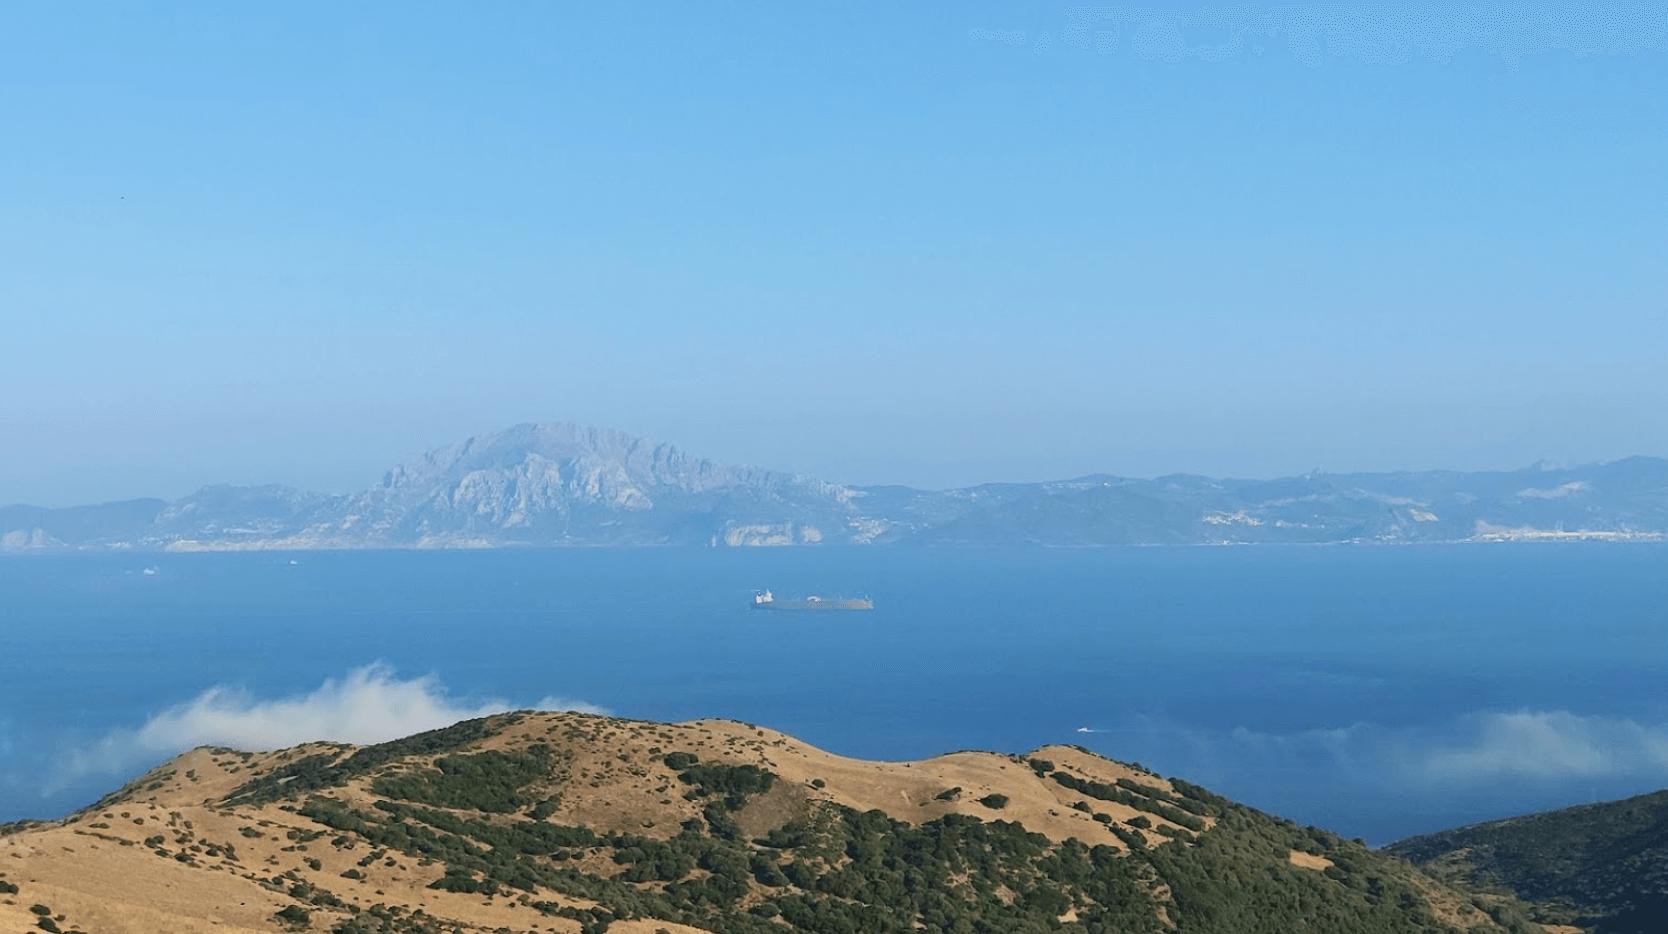 Mirador-del-Estrecho-Tarifa-Cadiz-Andalucia-España-Africa